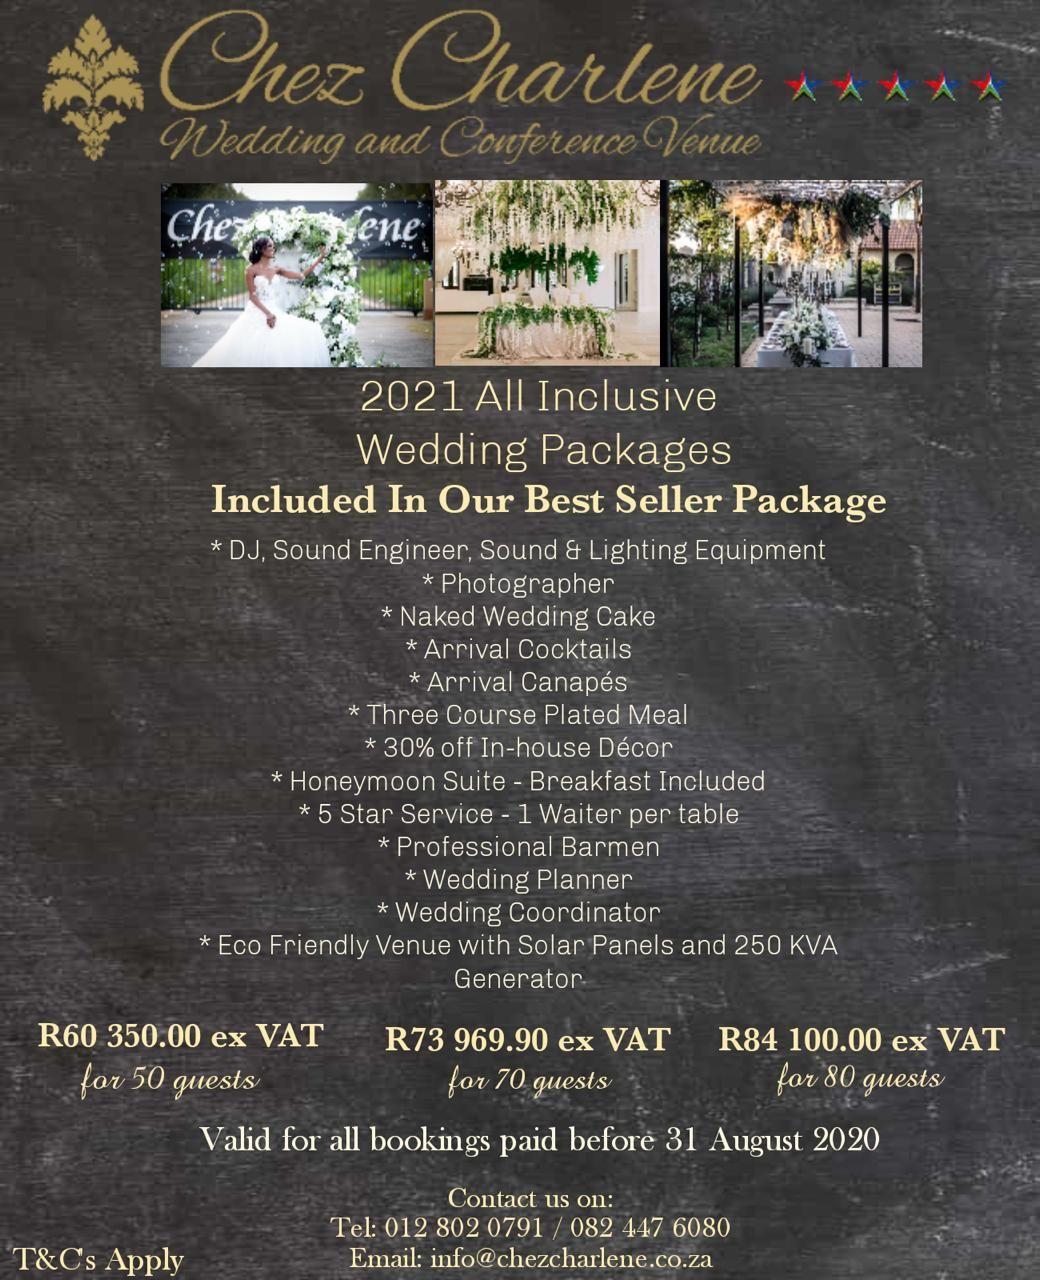 Beautiful Wedding Venue Beautiful Wedding Venues Wedding Venues All Inclusive Wedding Packages